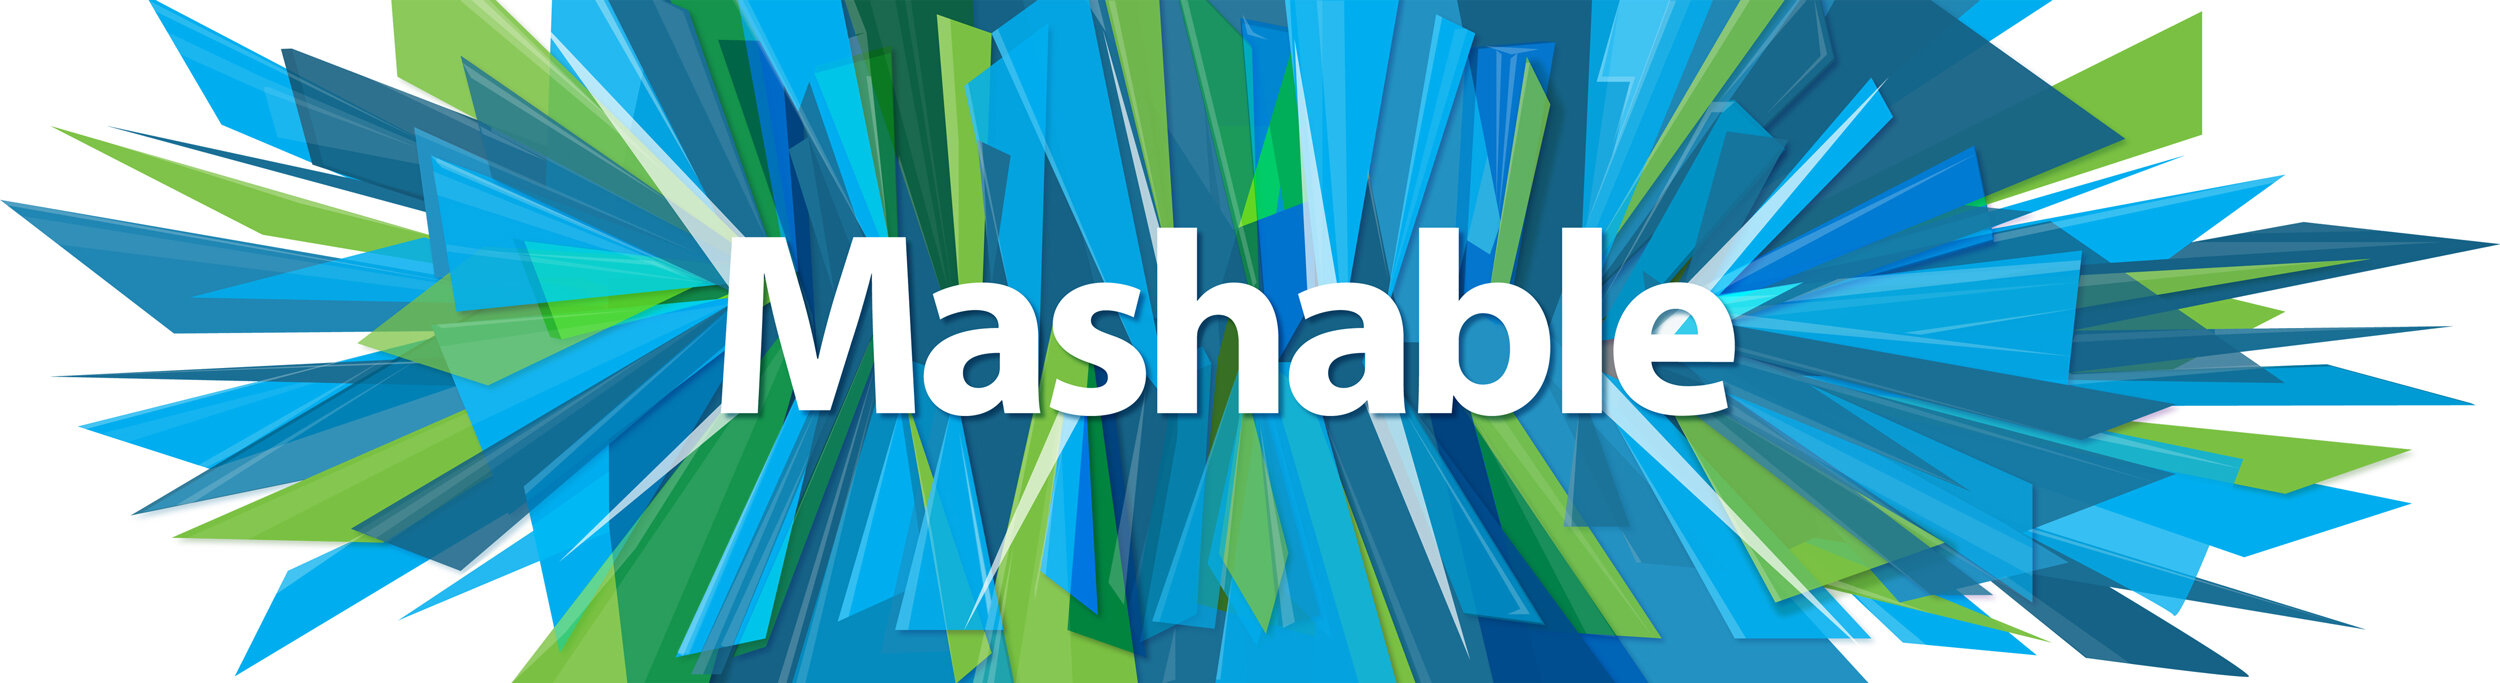 mashable-shards-nyc-mural.jpg